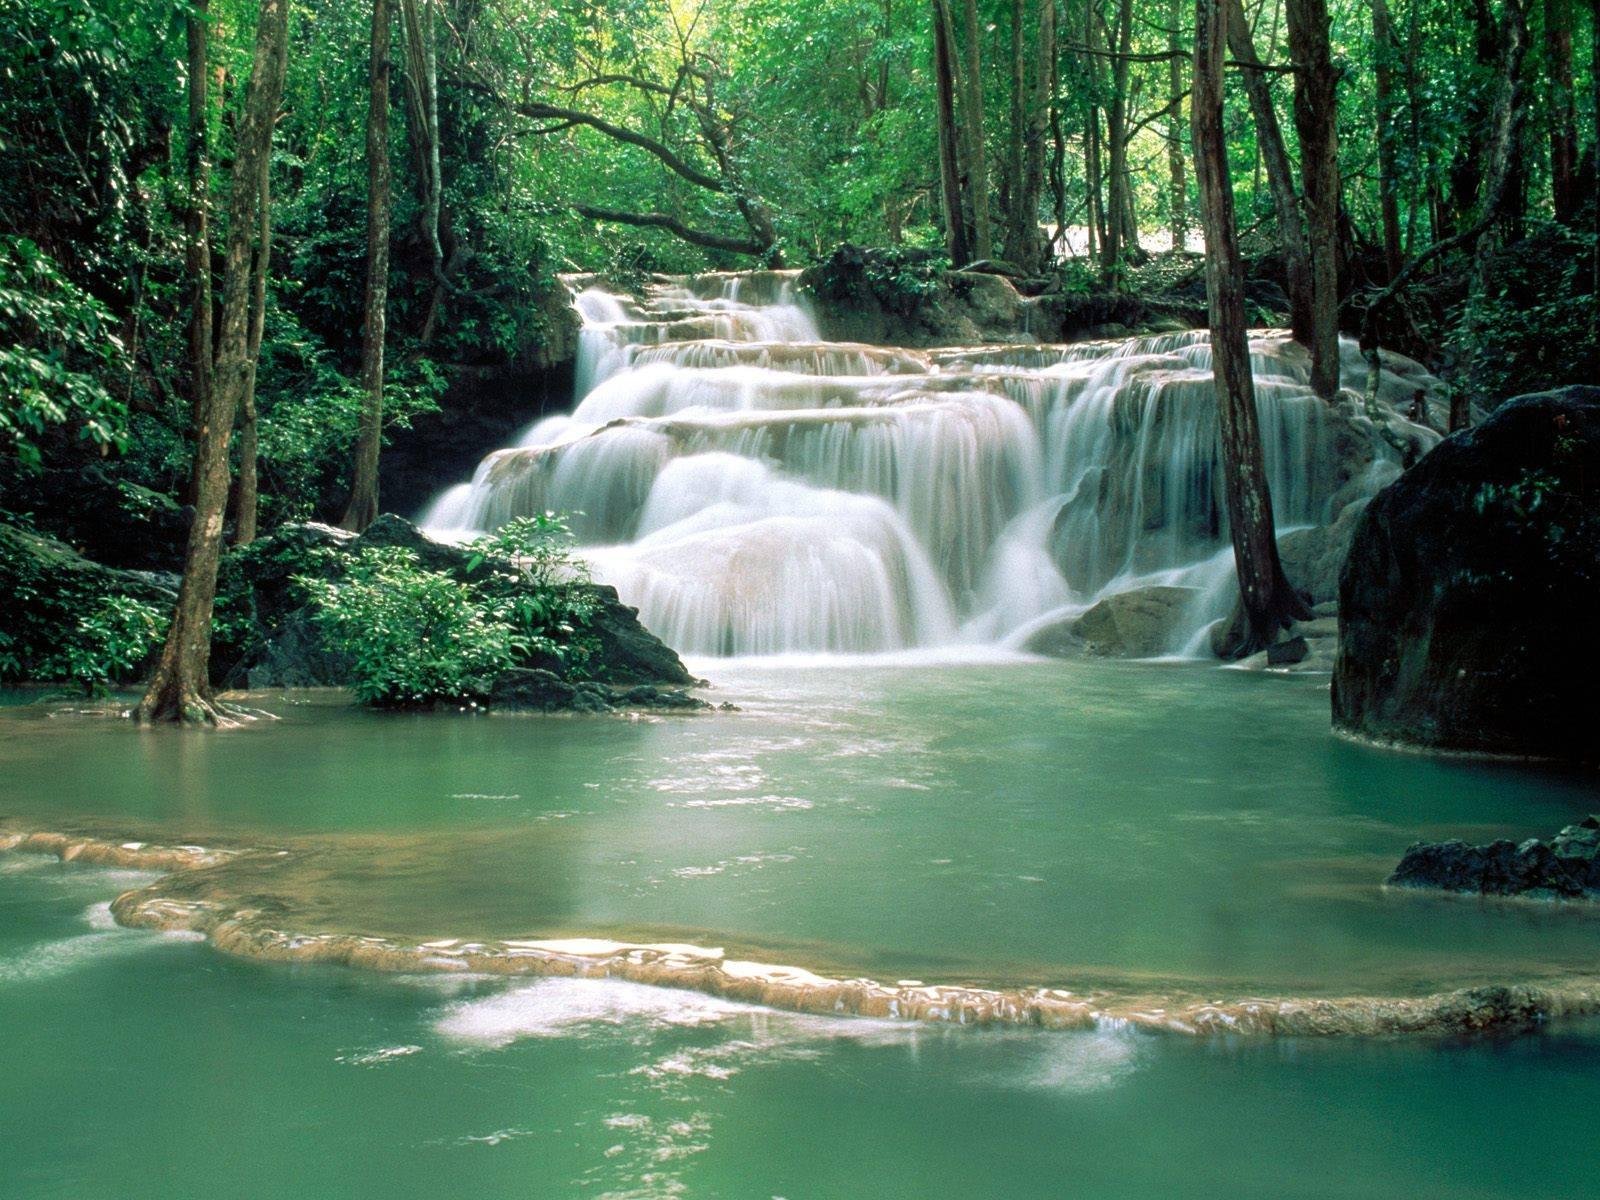 Kao20Pun20Temple20Waterfalls20Kanchanaburi20Region - waterfalls